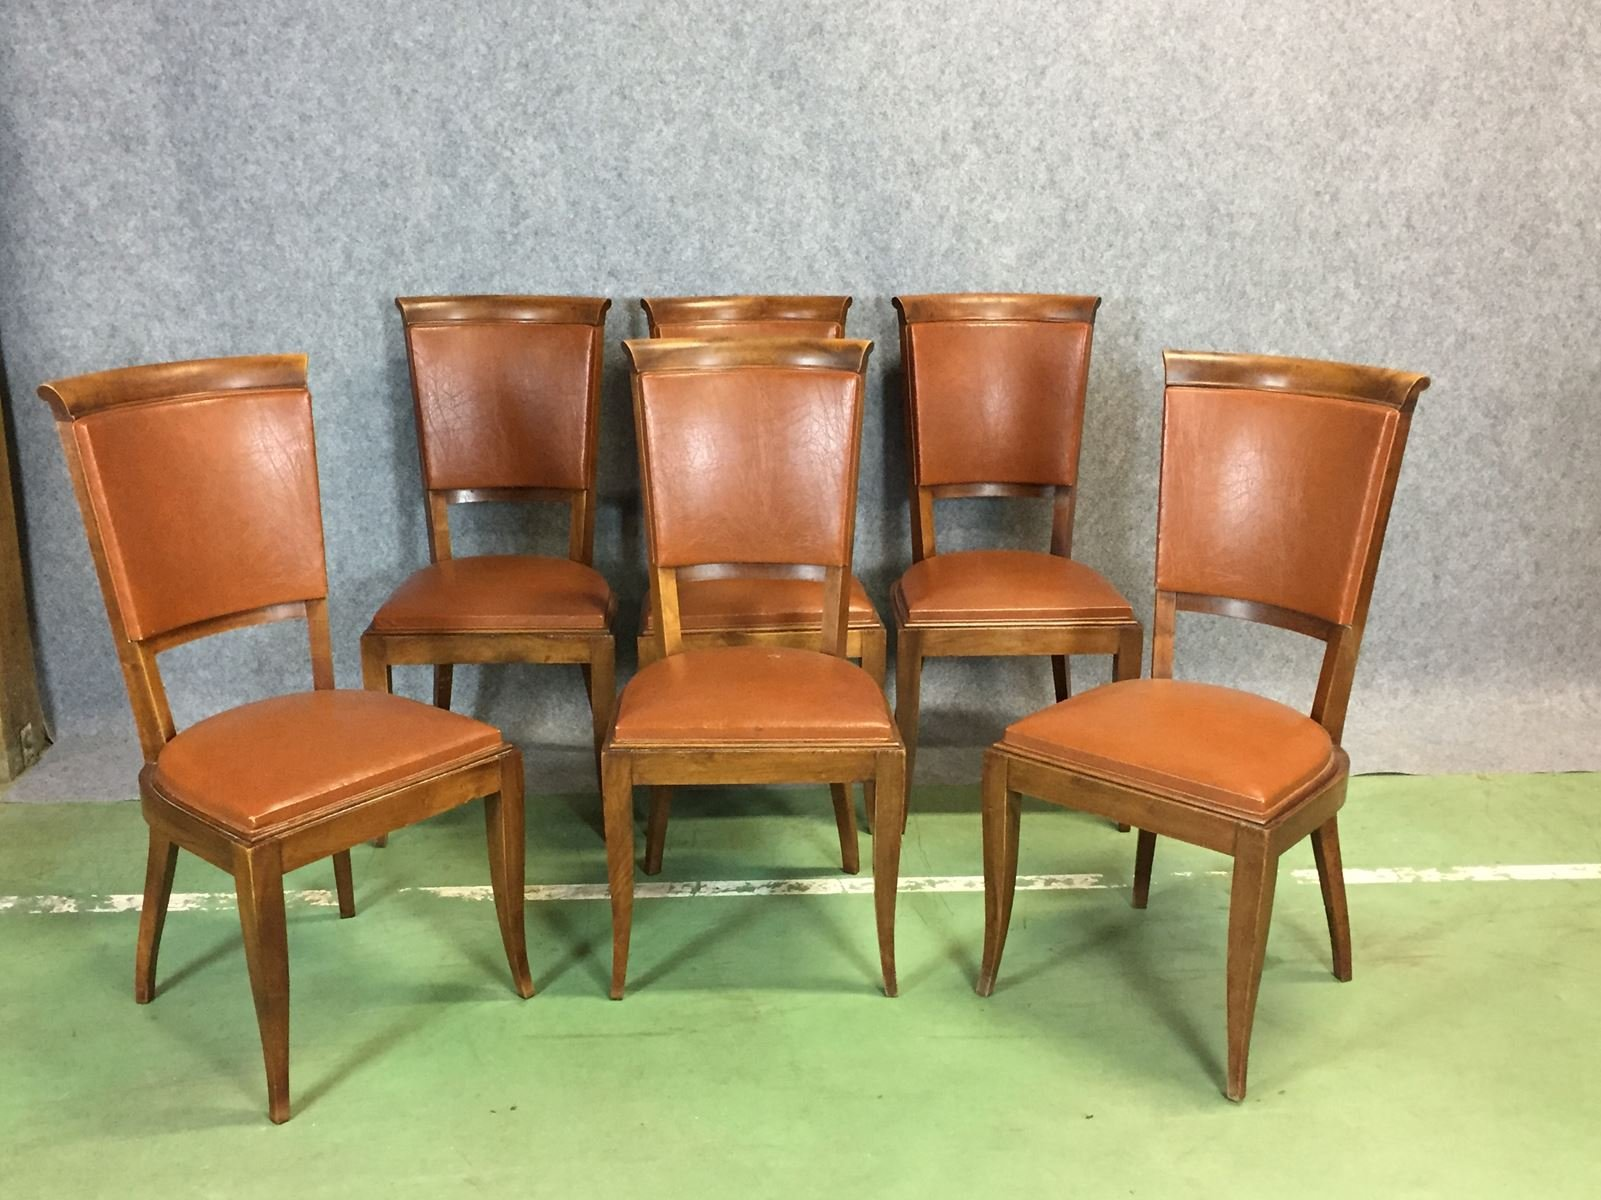 Esszimmerst hle 1960er 6er set bei pamono kaufen - Esszimmerstuhle 6er set ...